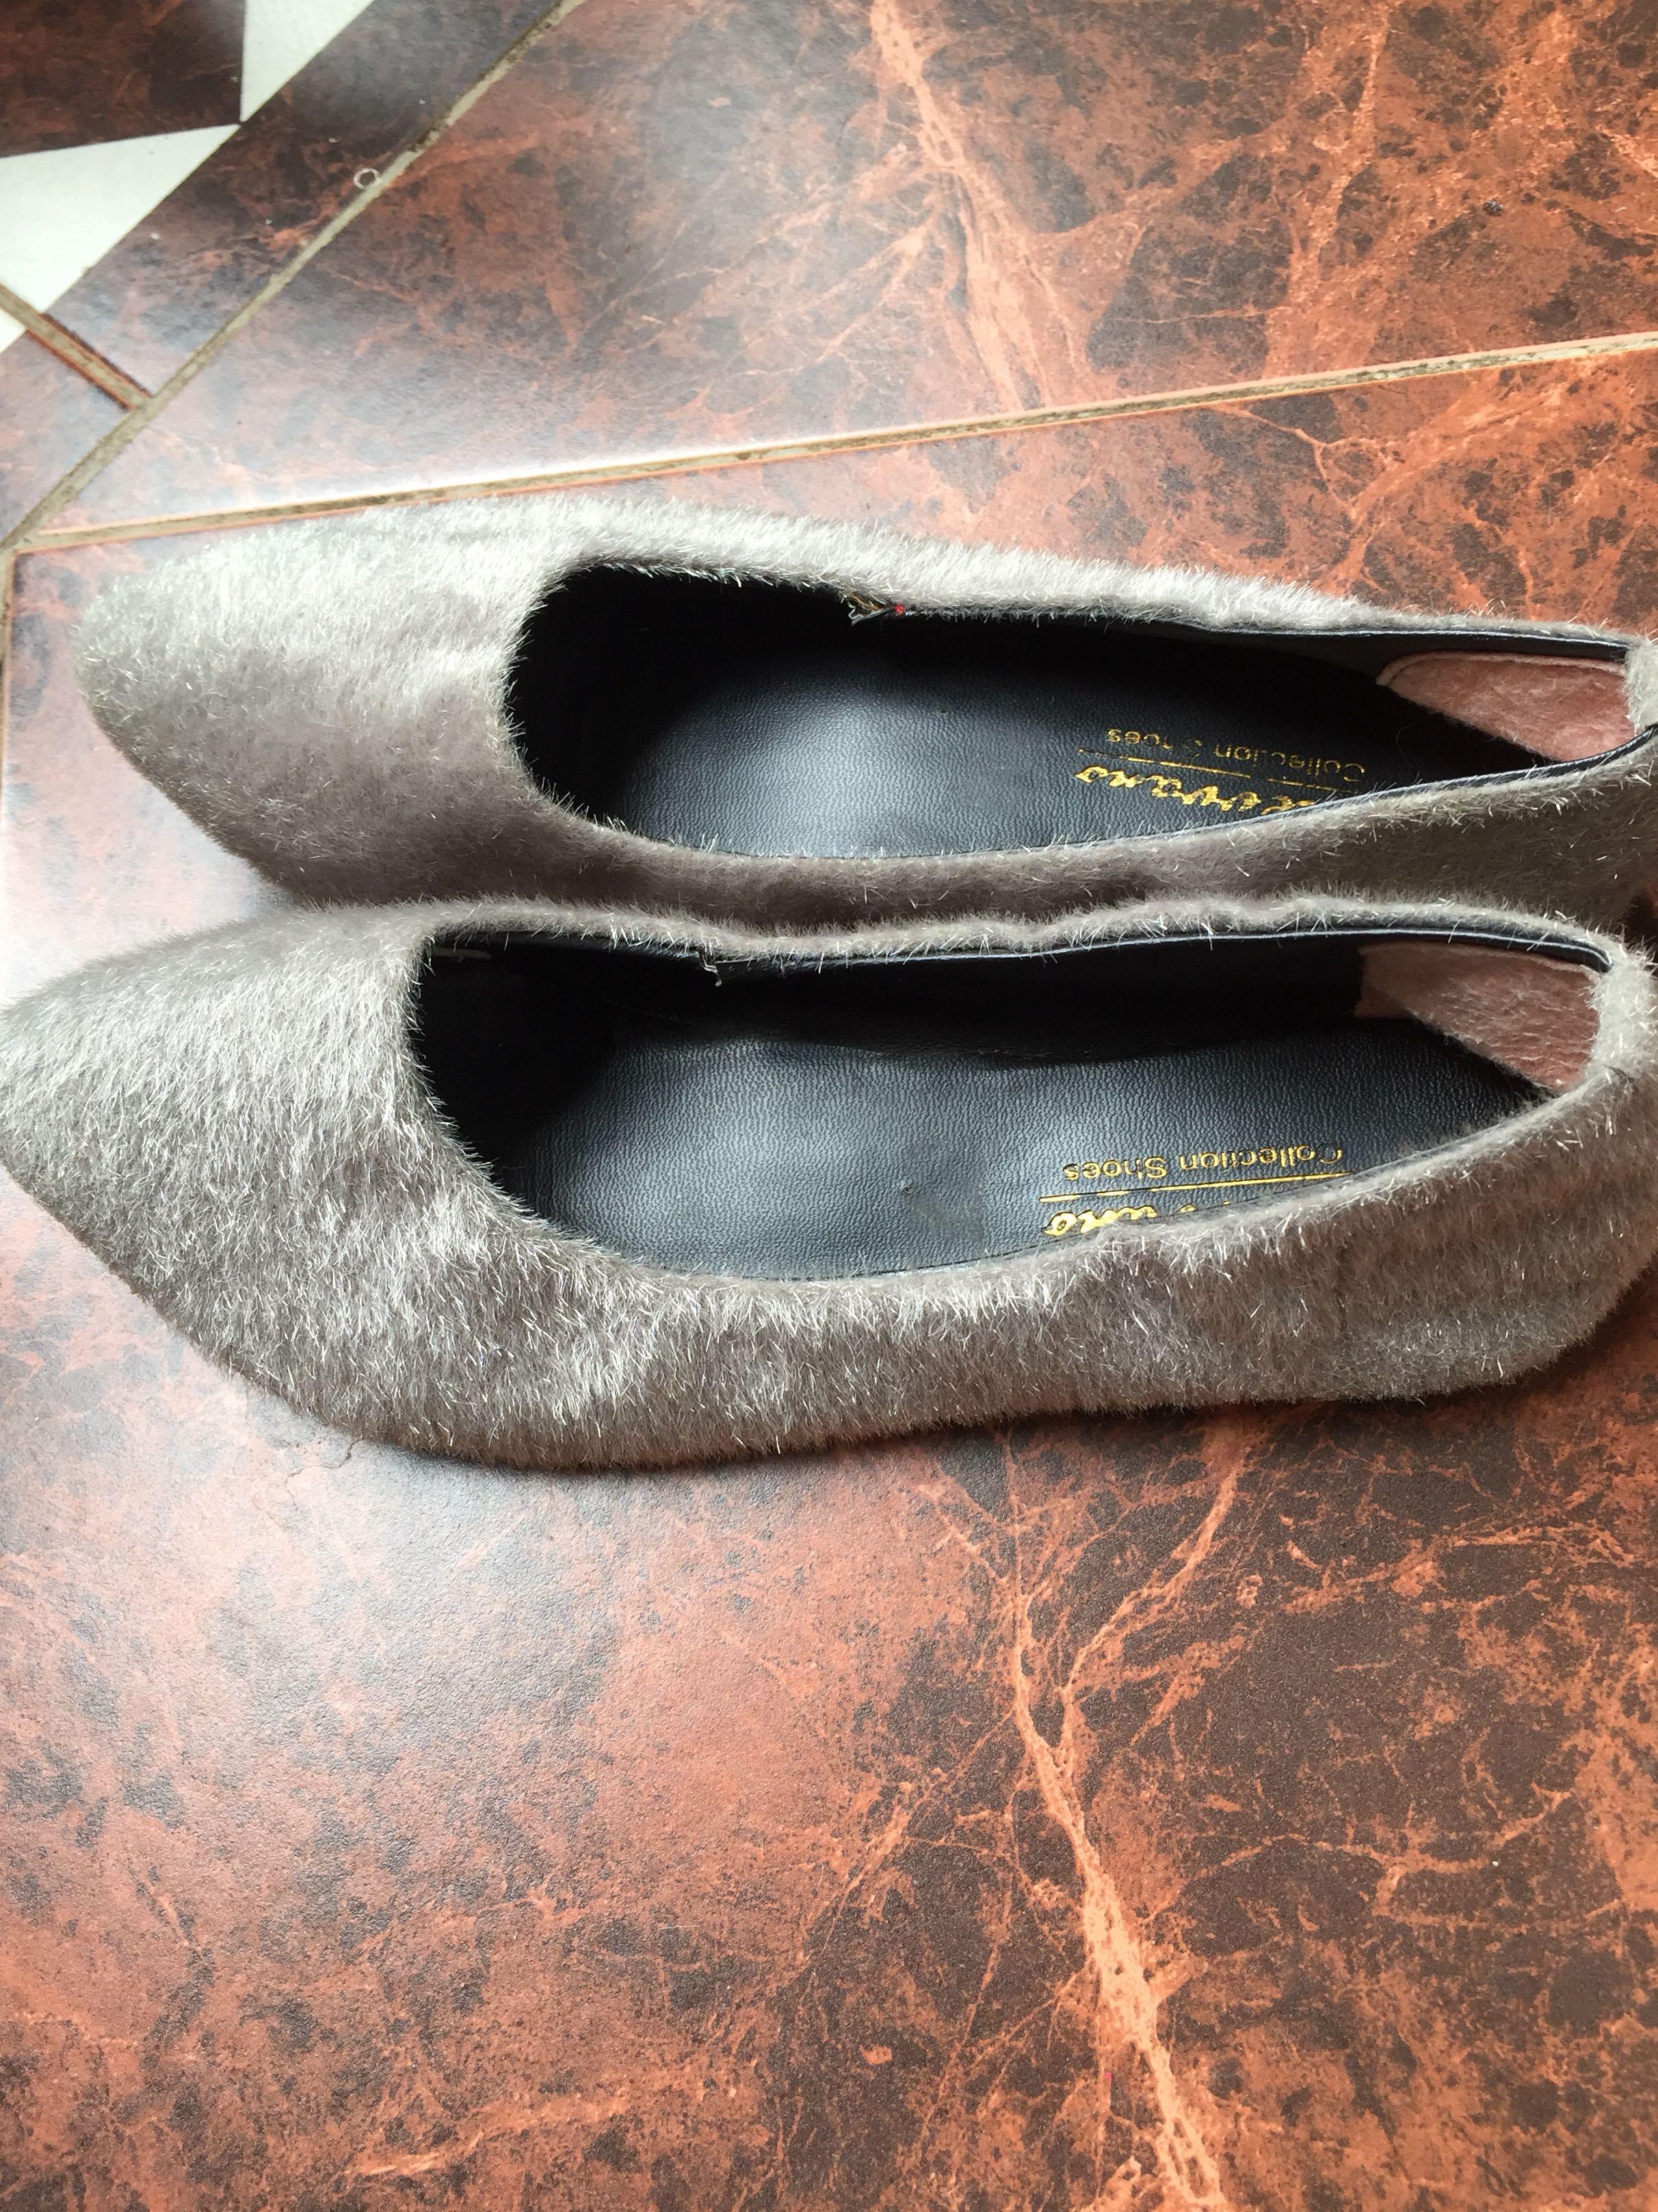 Sepatu teplek berbulu merk stevano ukuran 36, kondisi 70% msh enak dipake cuma blm dicuci. Panjang kaki 22-23 cm, warna abu abu.